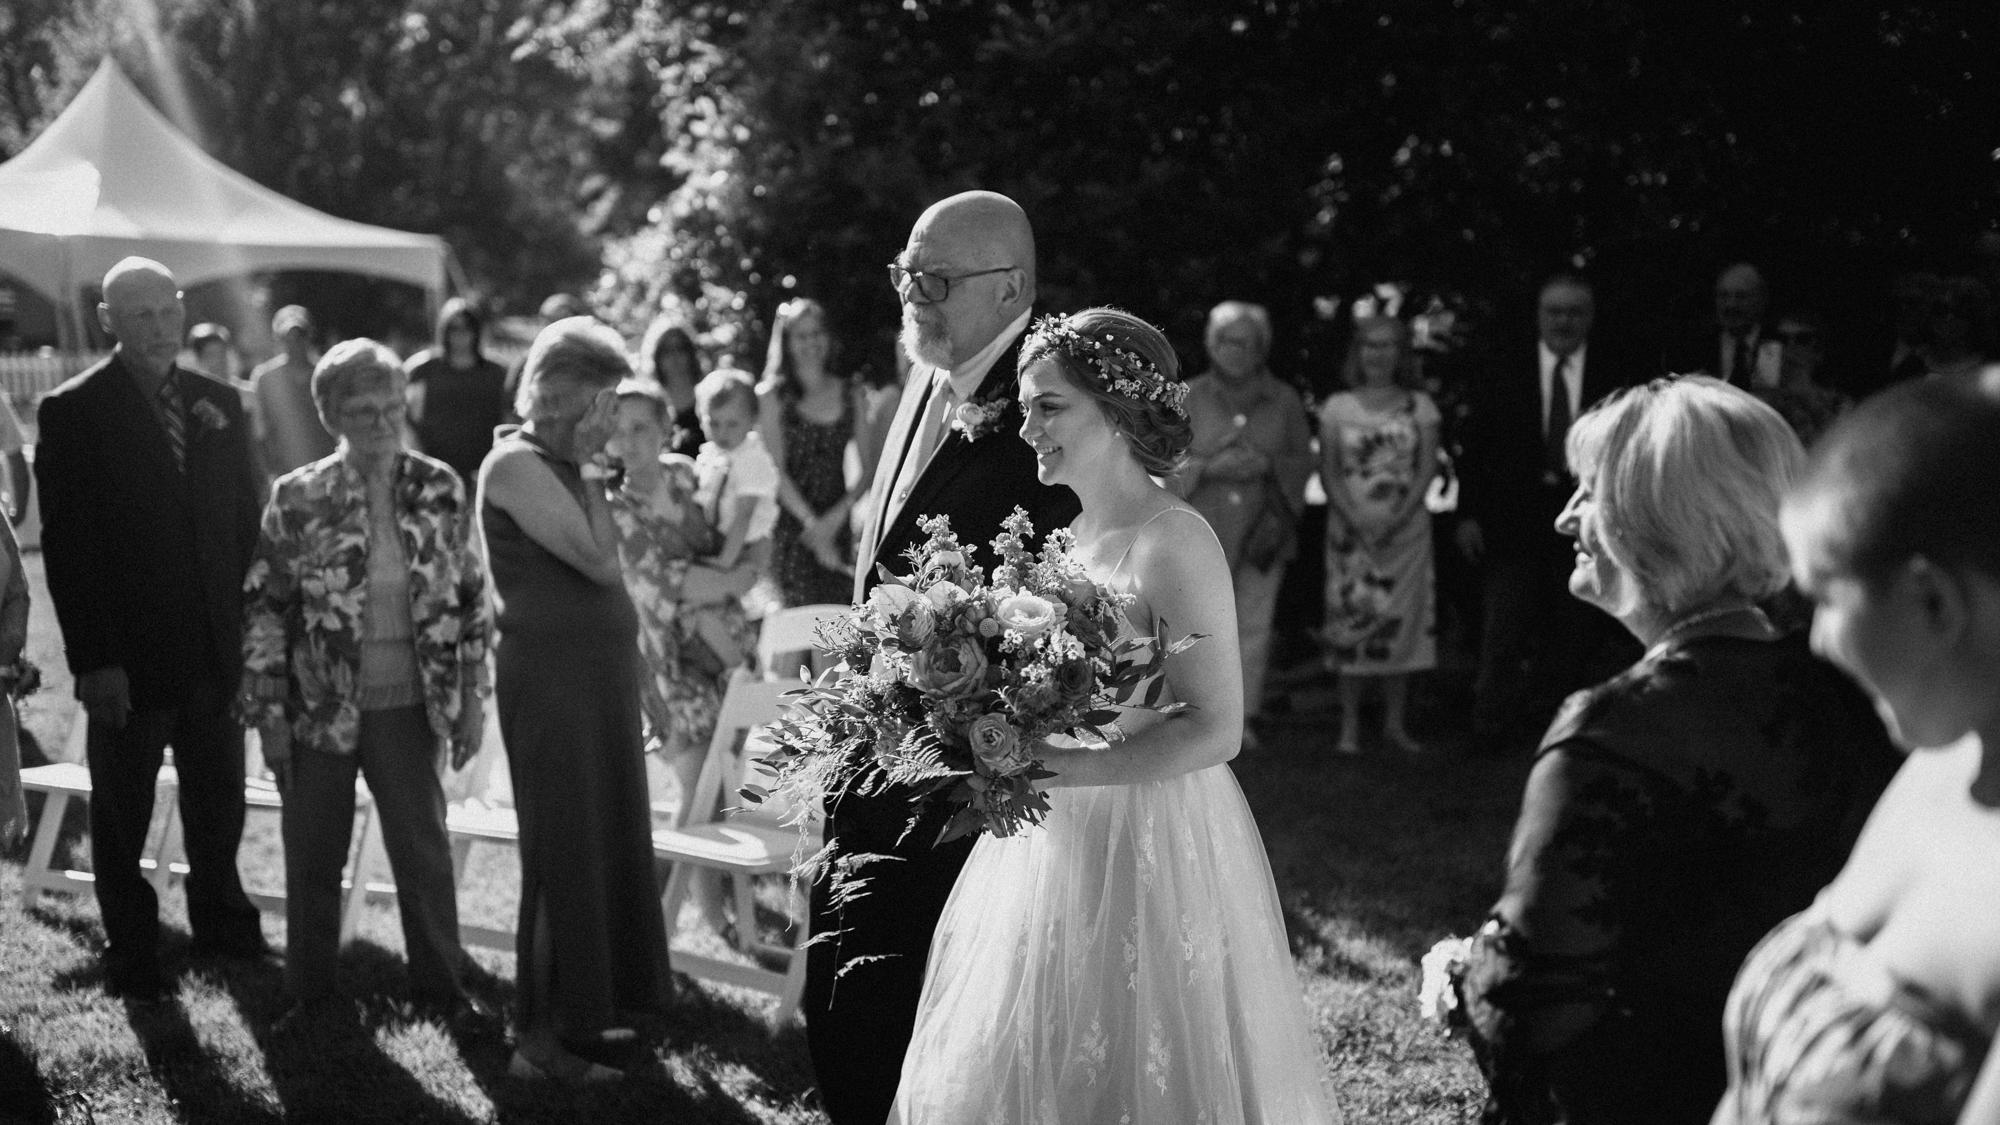 alec_vanderboom_kansas_city_mo_wedding_photos-0042.jpg